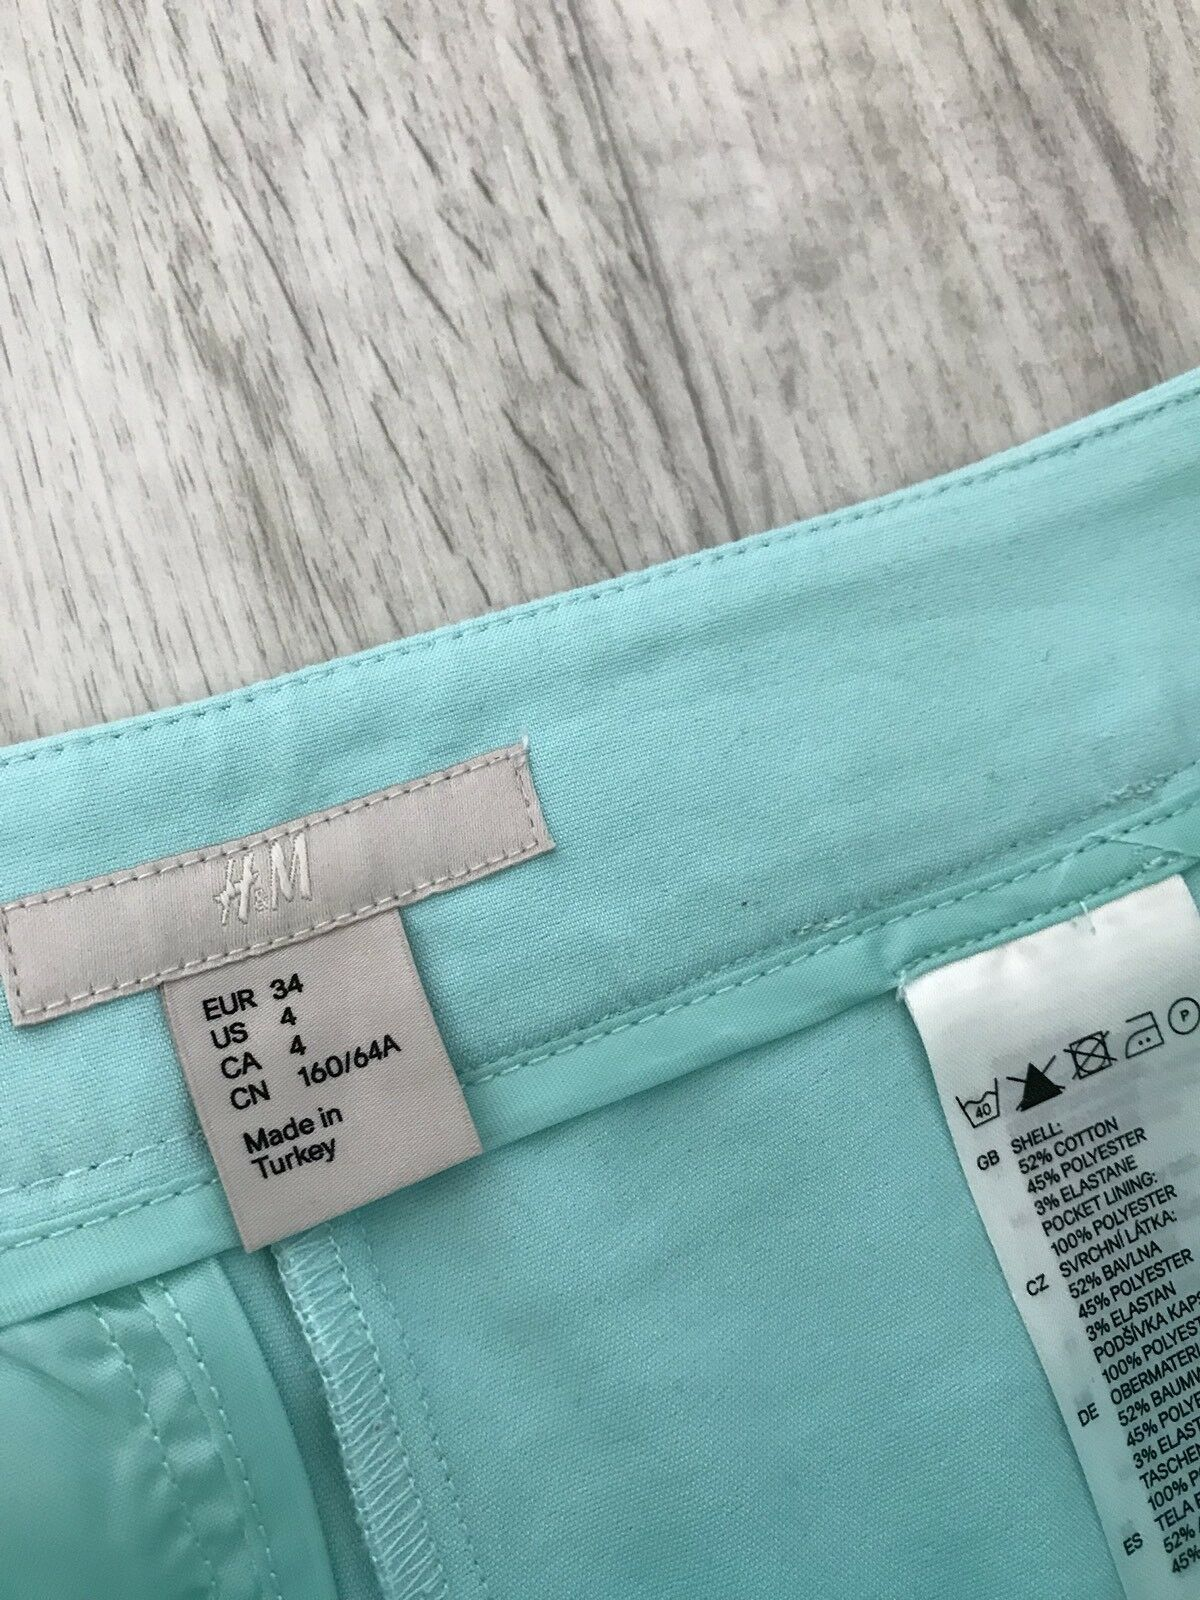 H&M H&M H&M TREND BLOGGER Luce Turchese Blu verde City Pantaloncini Uk 8 US 4 EUR 34 417fe1